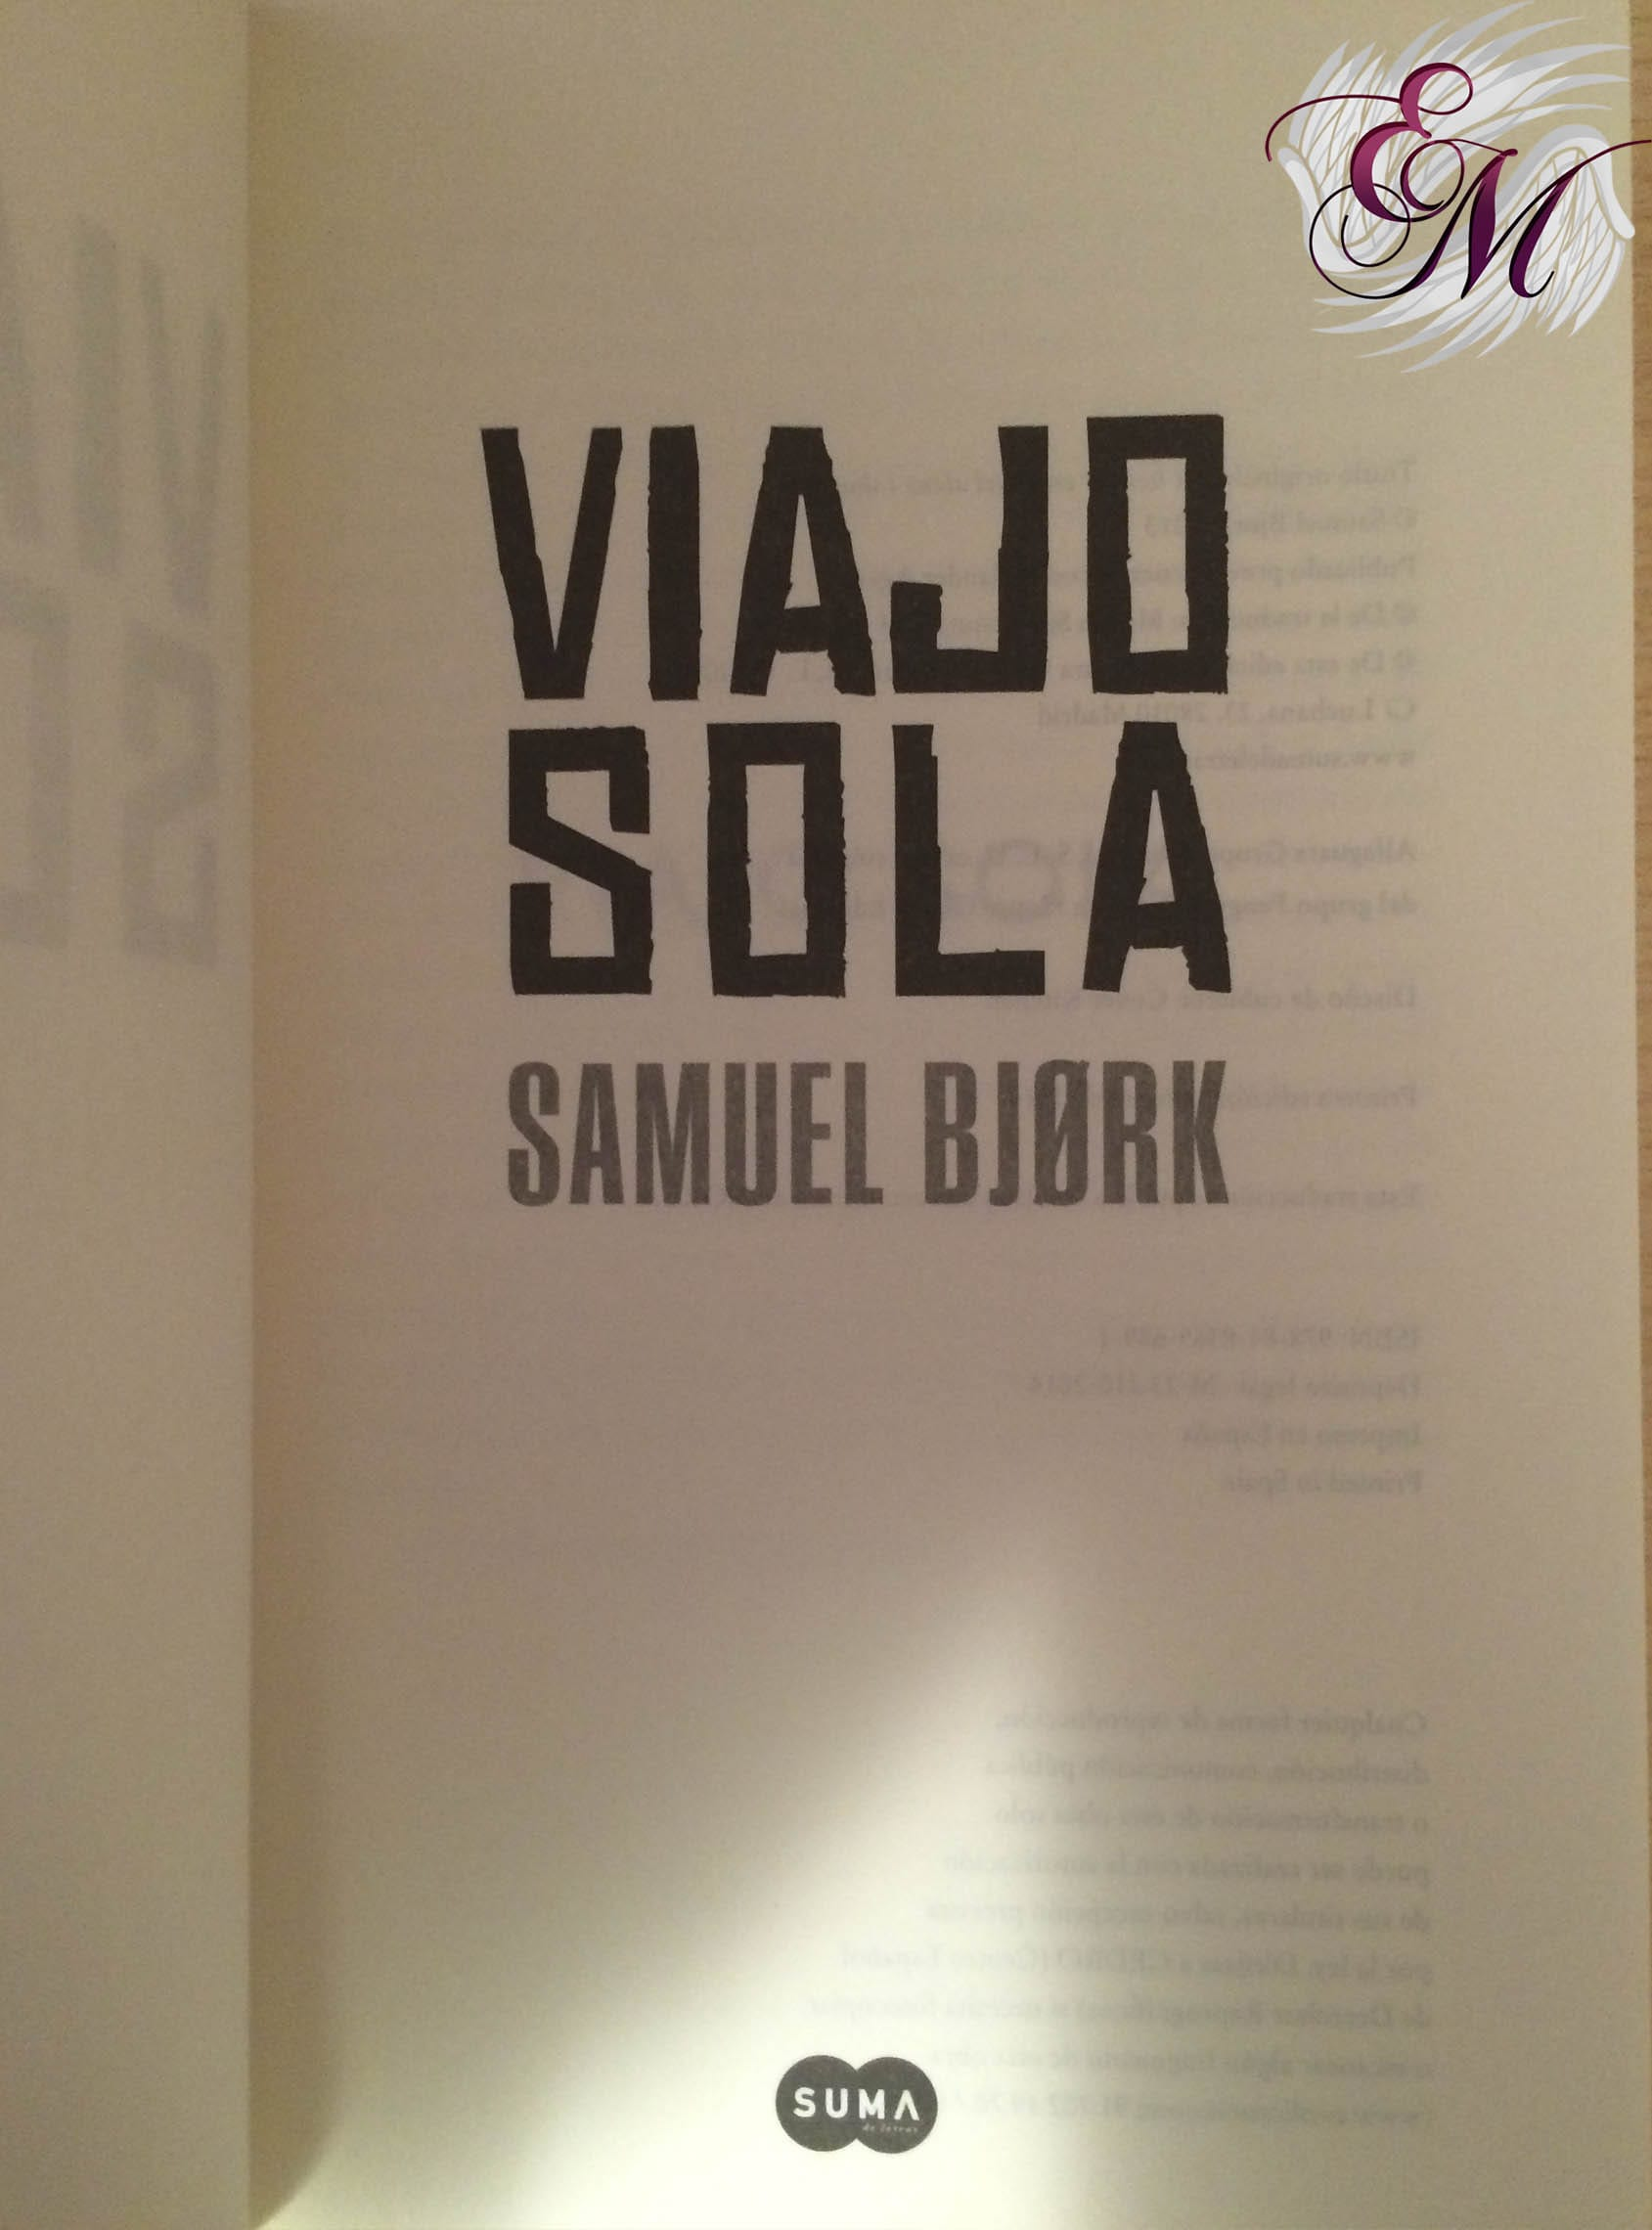 Viajo sola, de Samuel Bjørk - Reseña